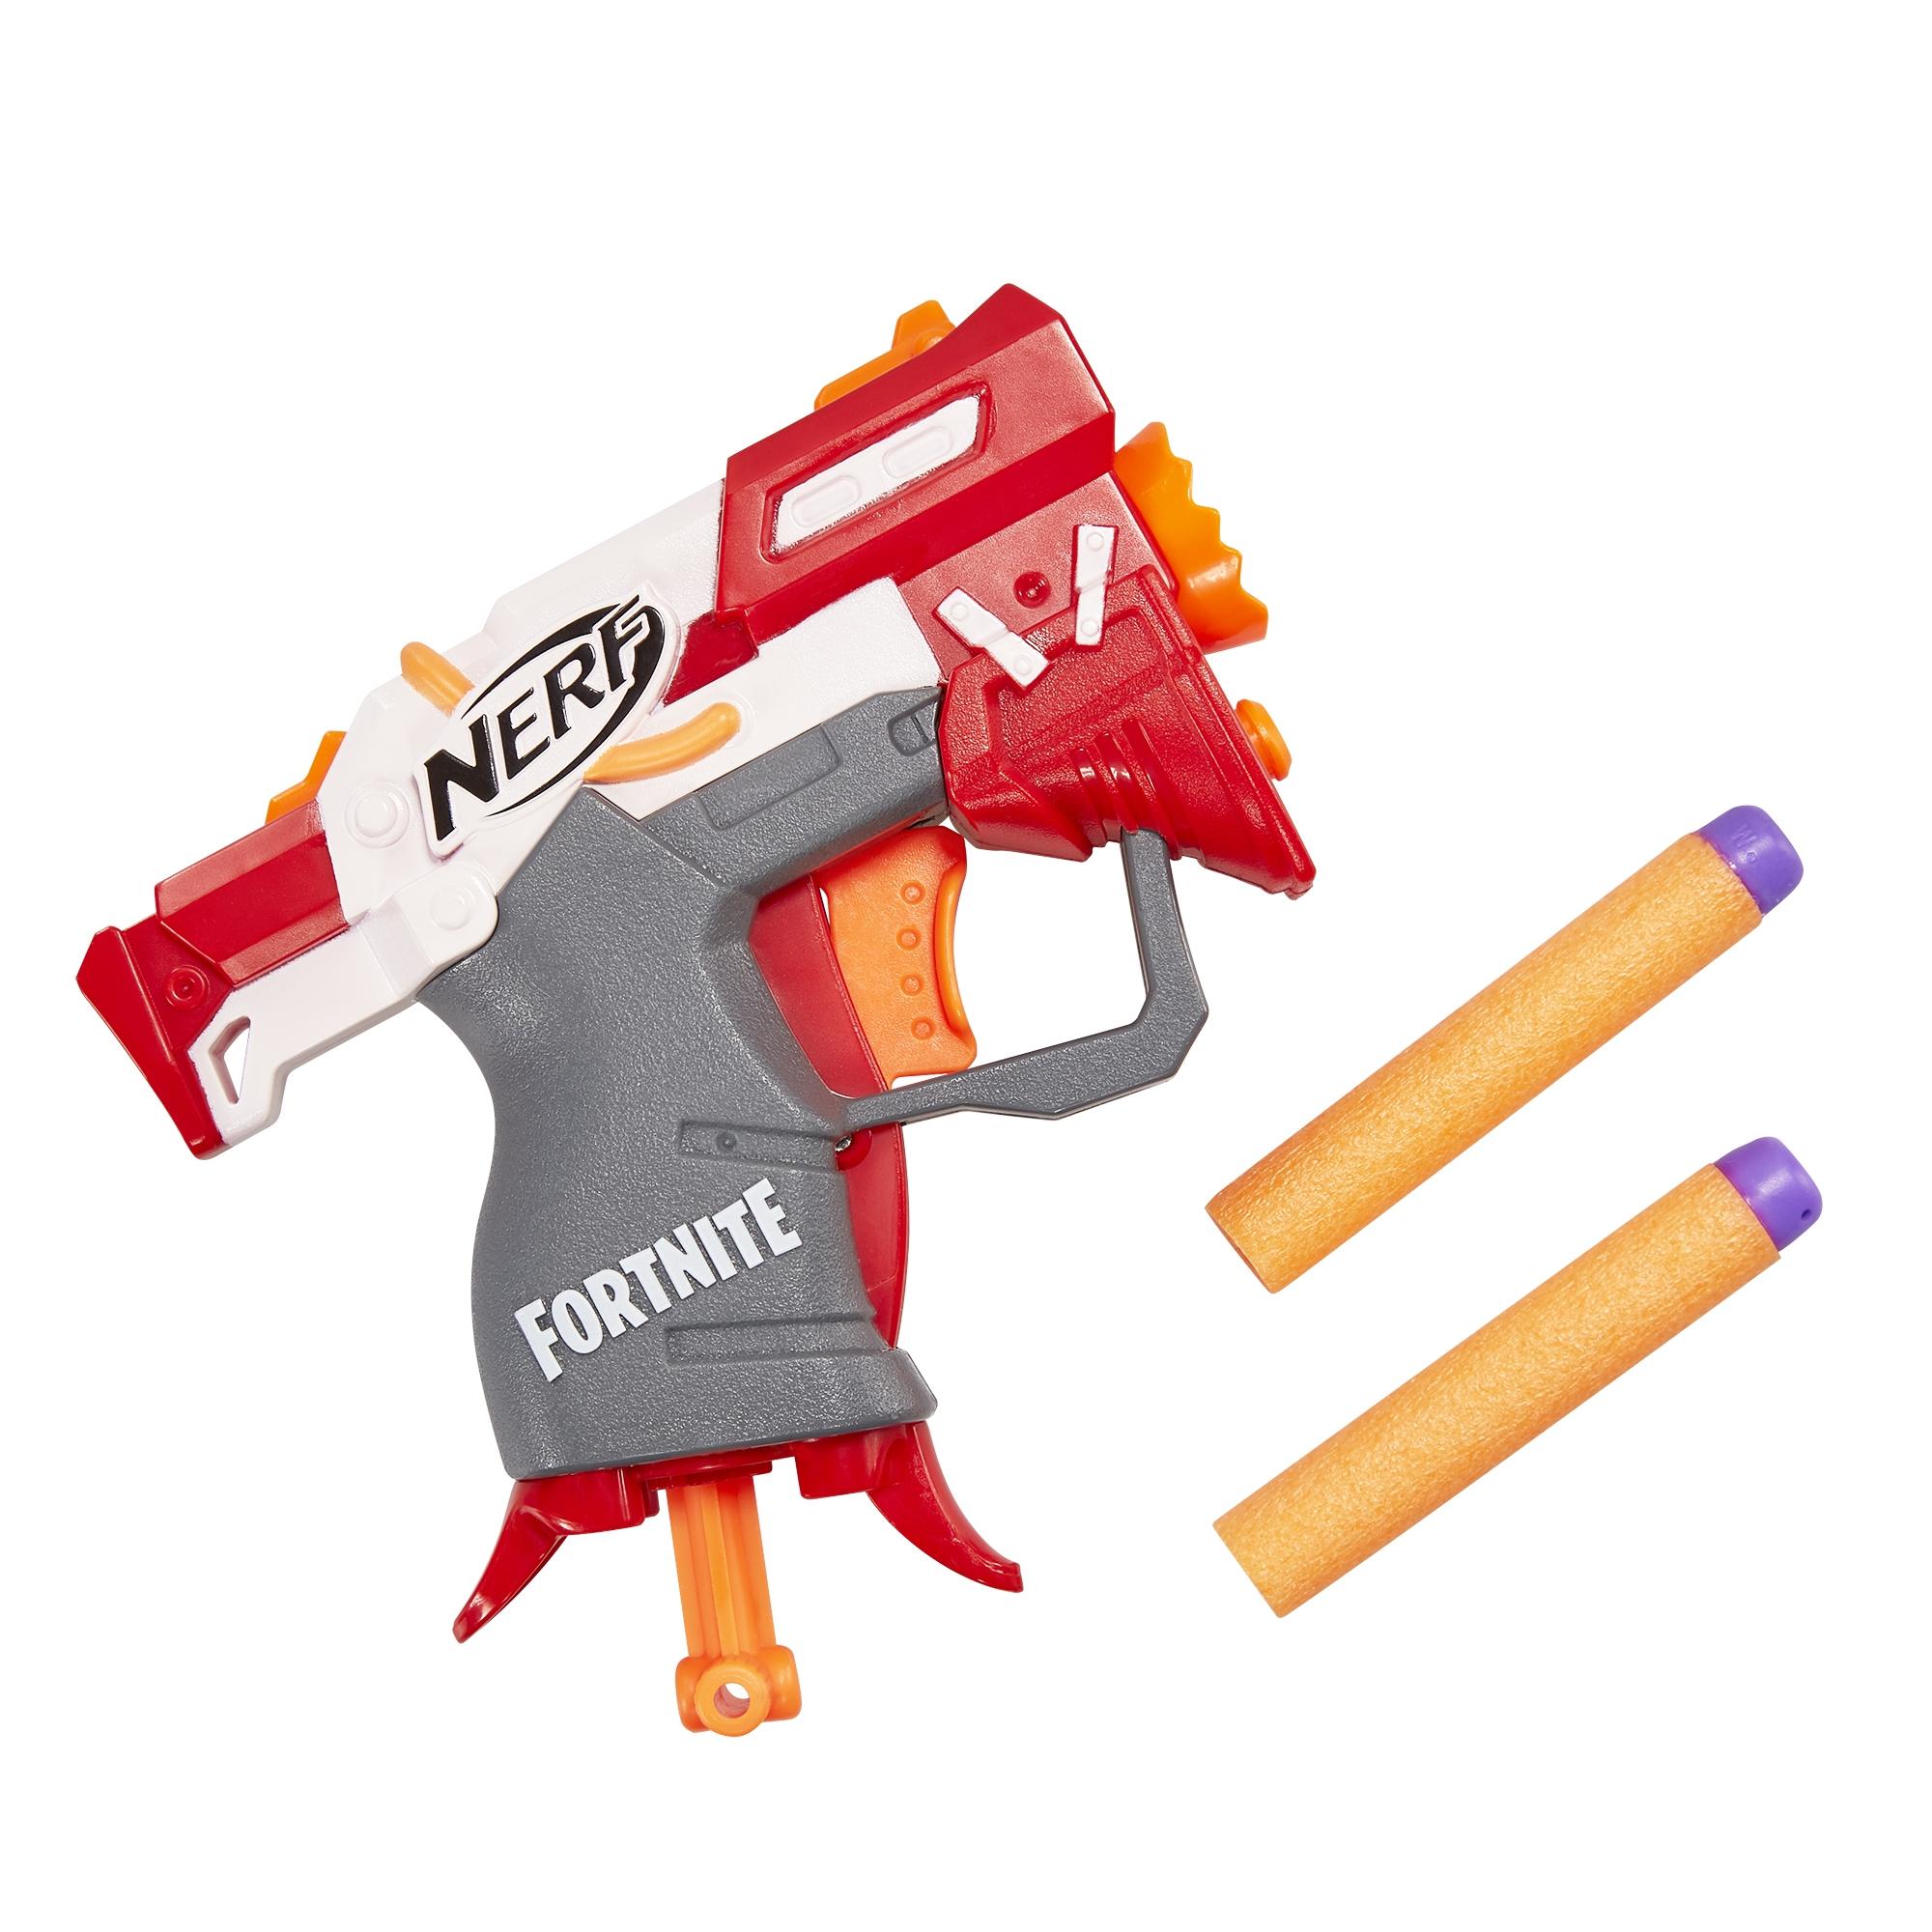 Nerf Fortnite TS Nerf MicroShots Dart-Firing Toy Blaster and 2 Official Nerf Elite Darts